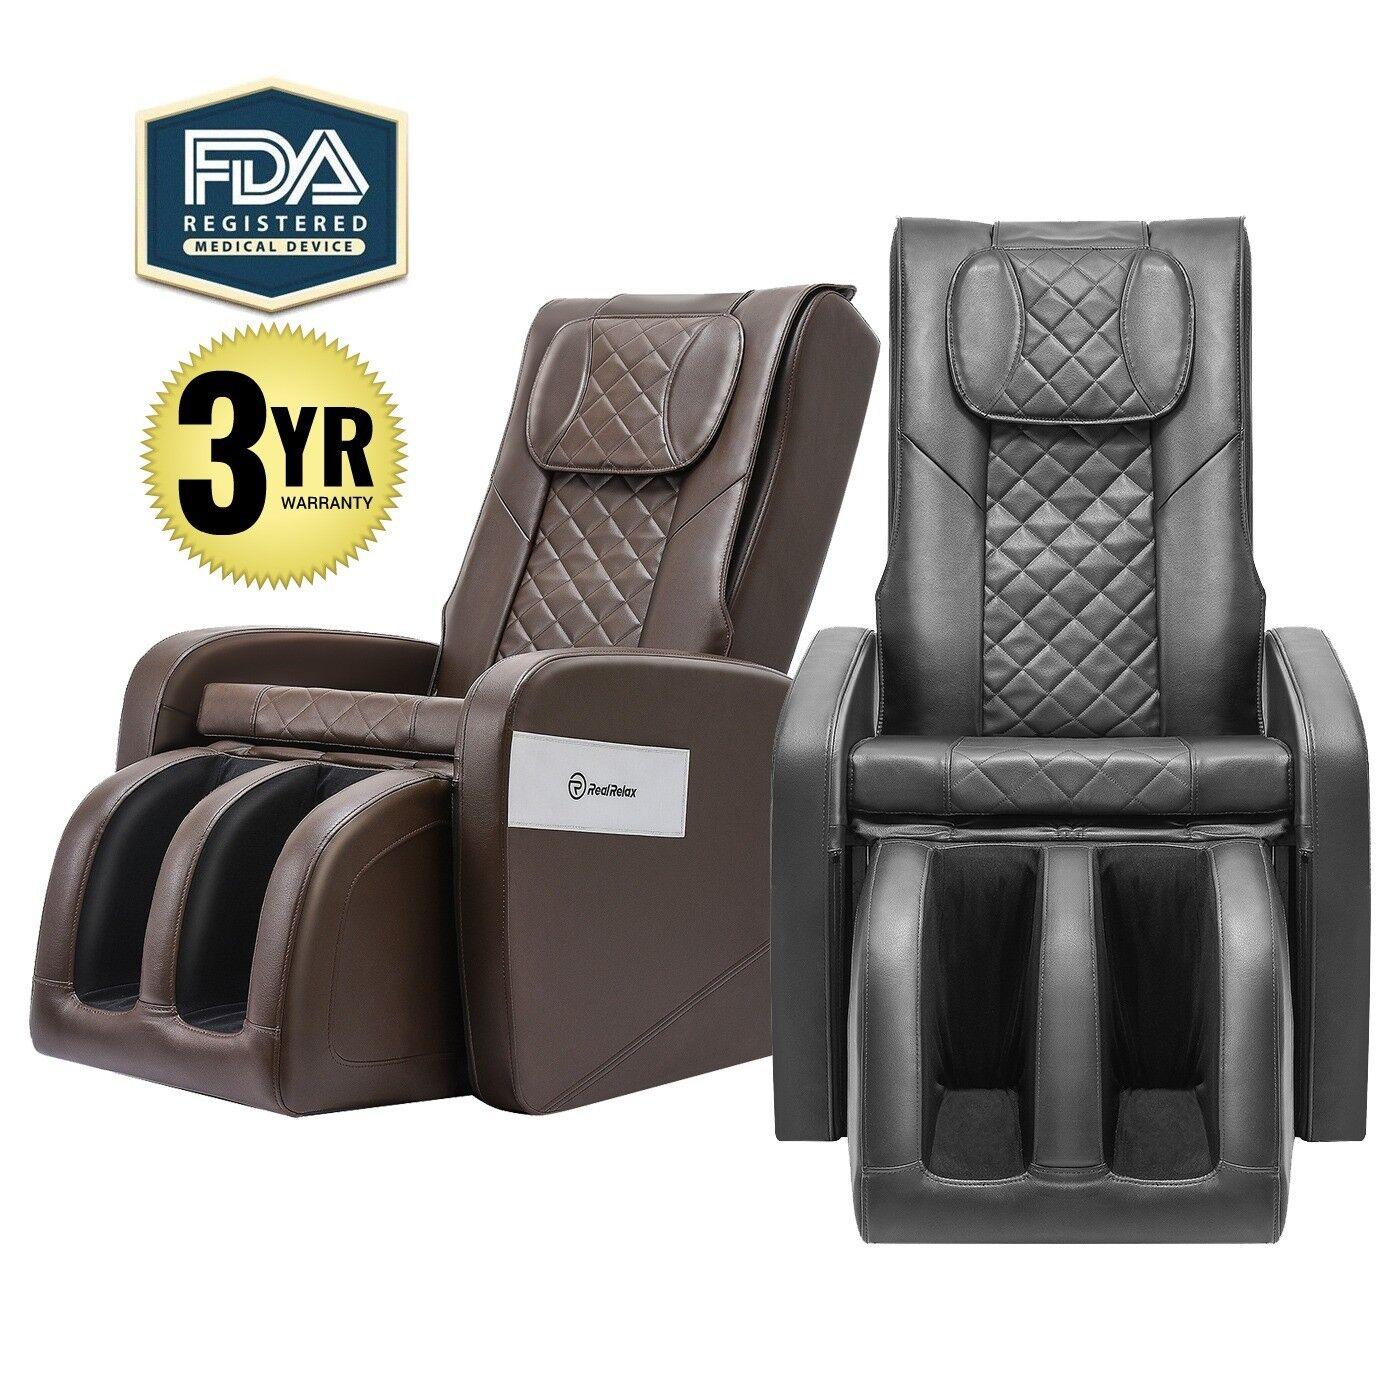 2019 zero gravity massage chair 3yr warranty